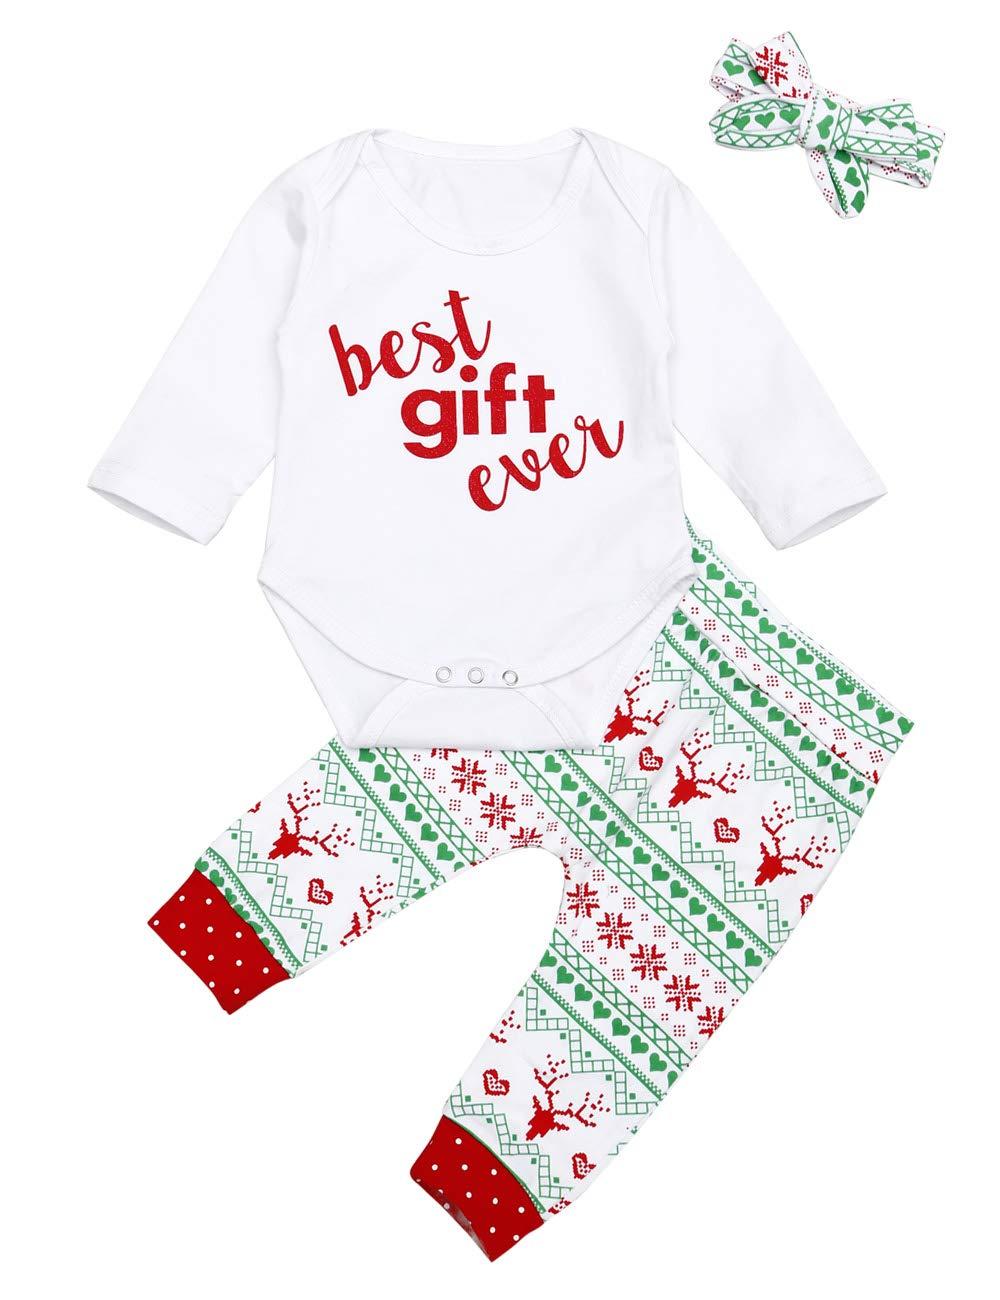 3PCS Newborn Baby Girl 1st Christmas Romper Tops Dress Skirt Outfits Clothes Set